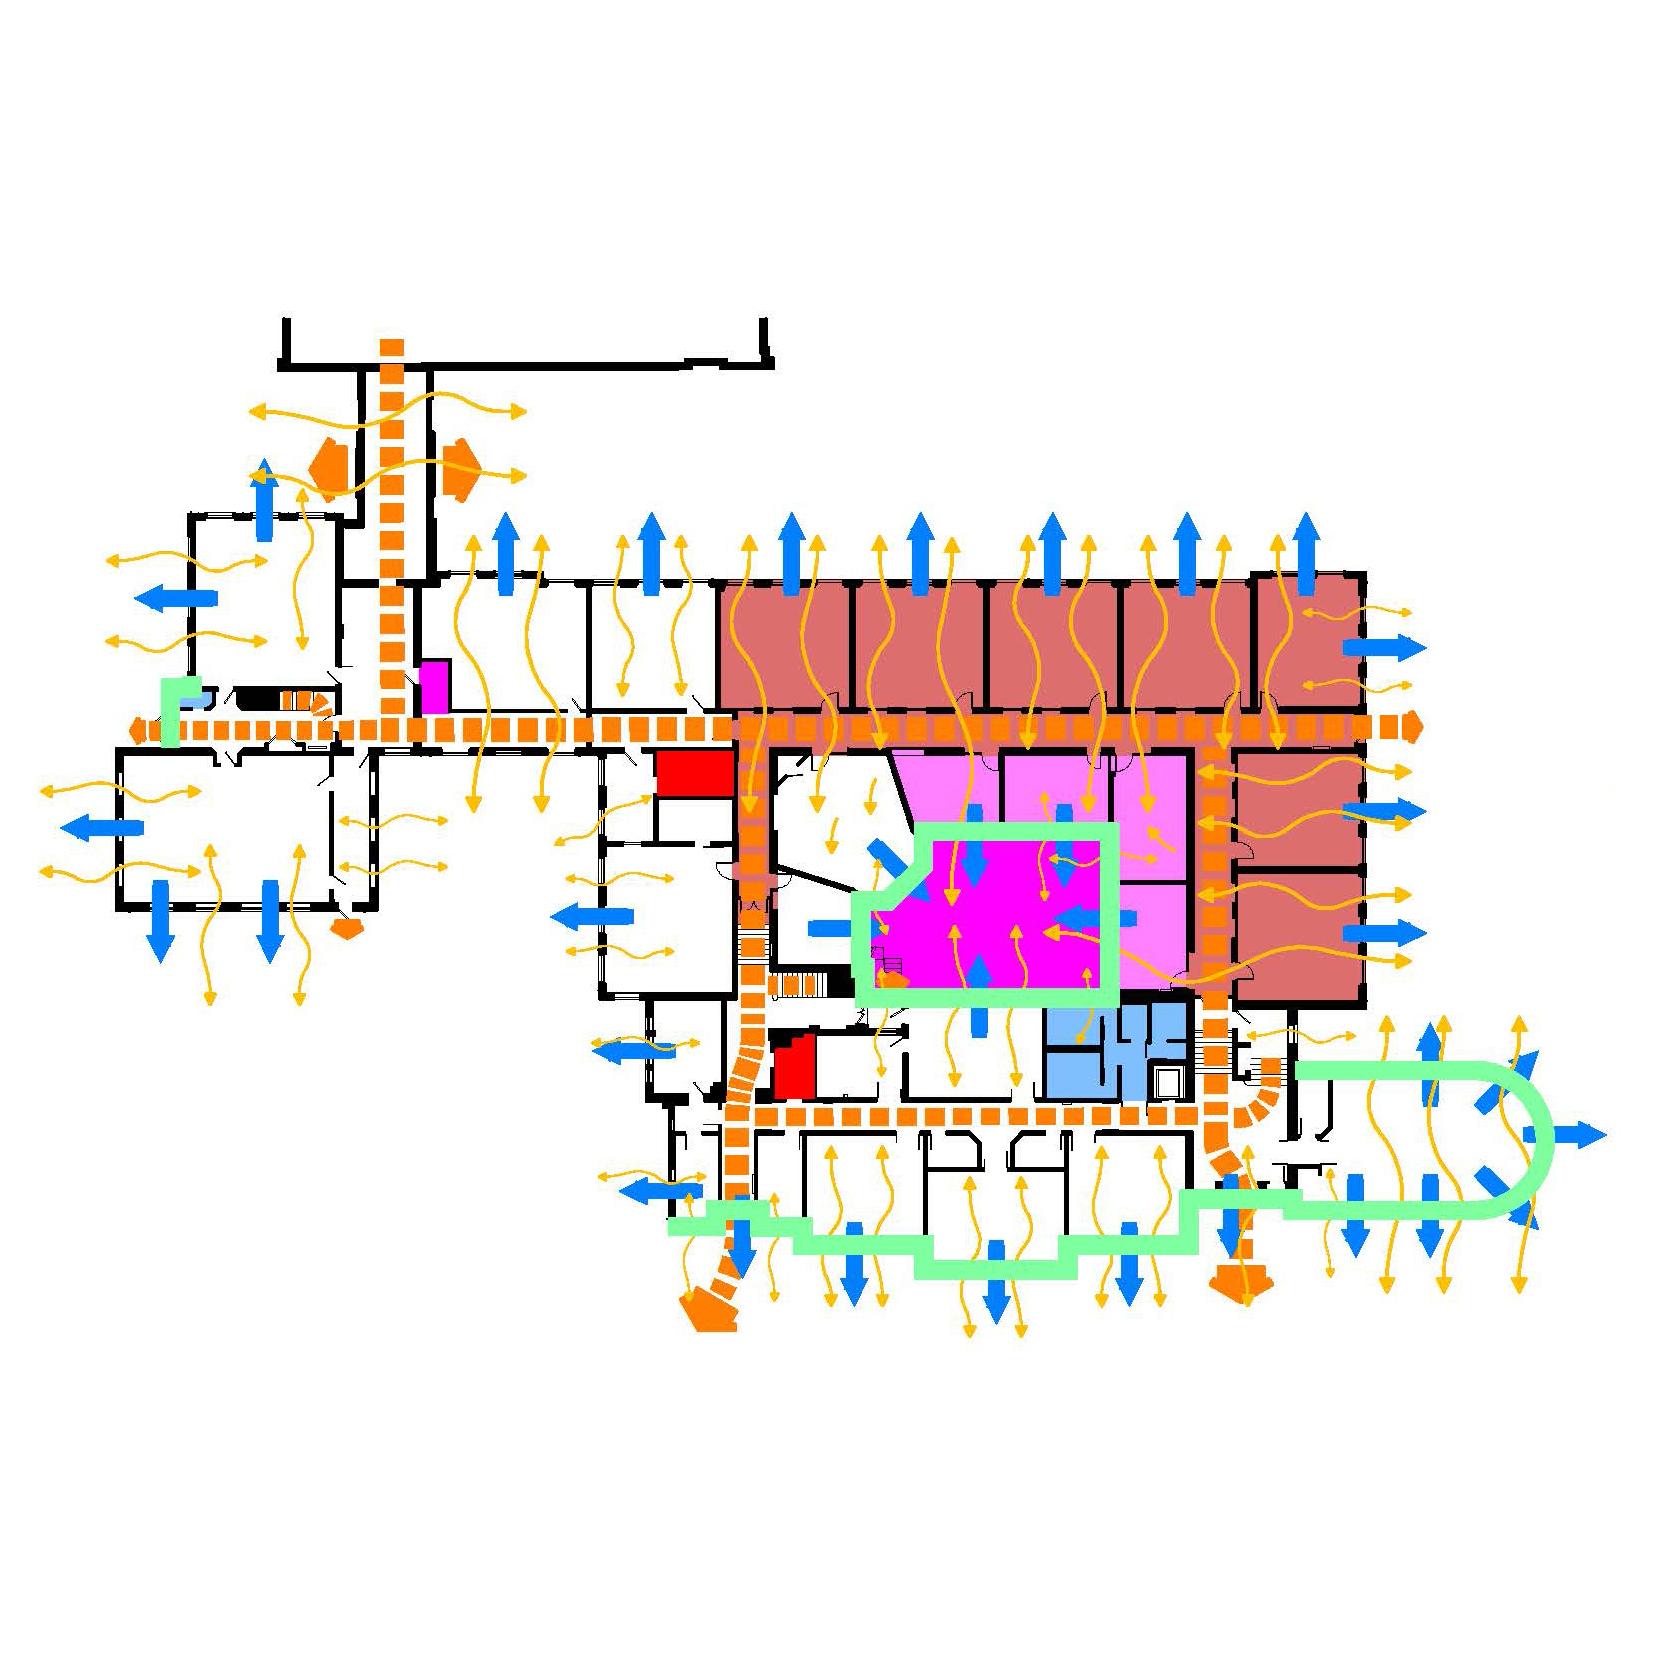 st johns school, leatherhead | hamilton building